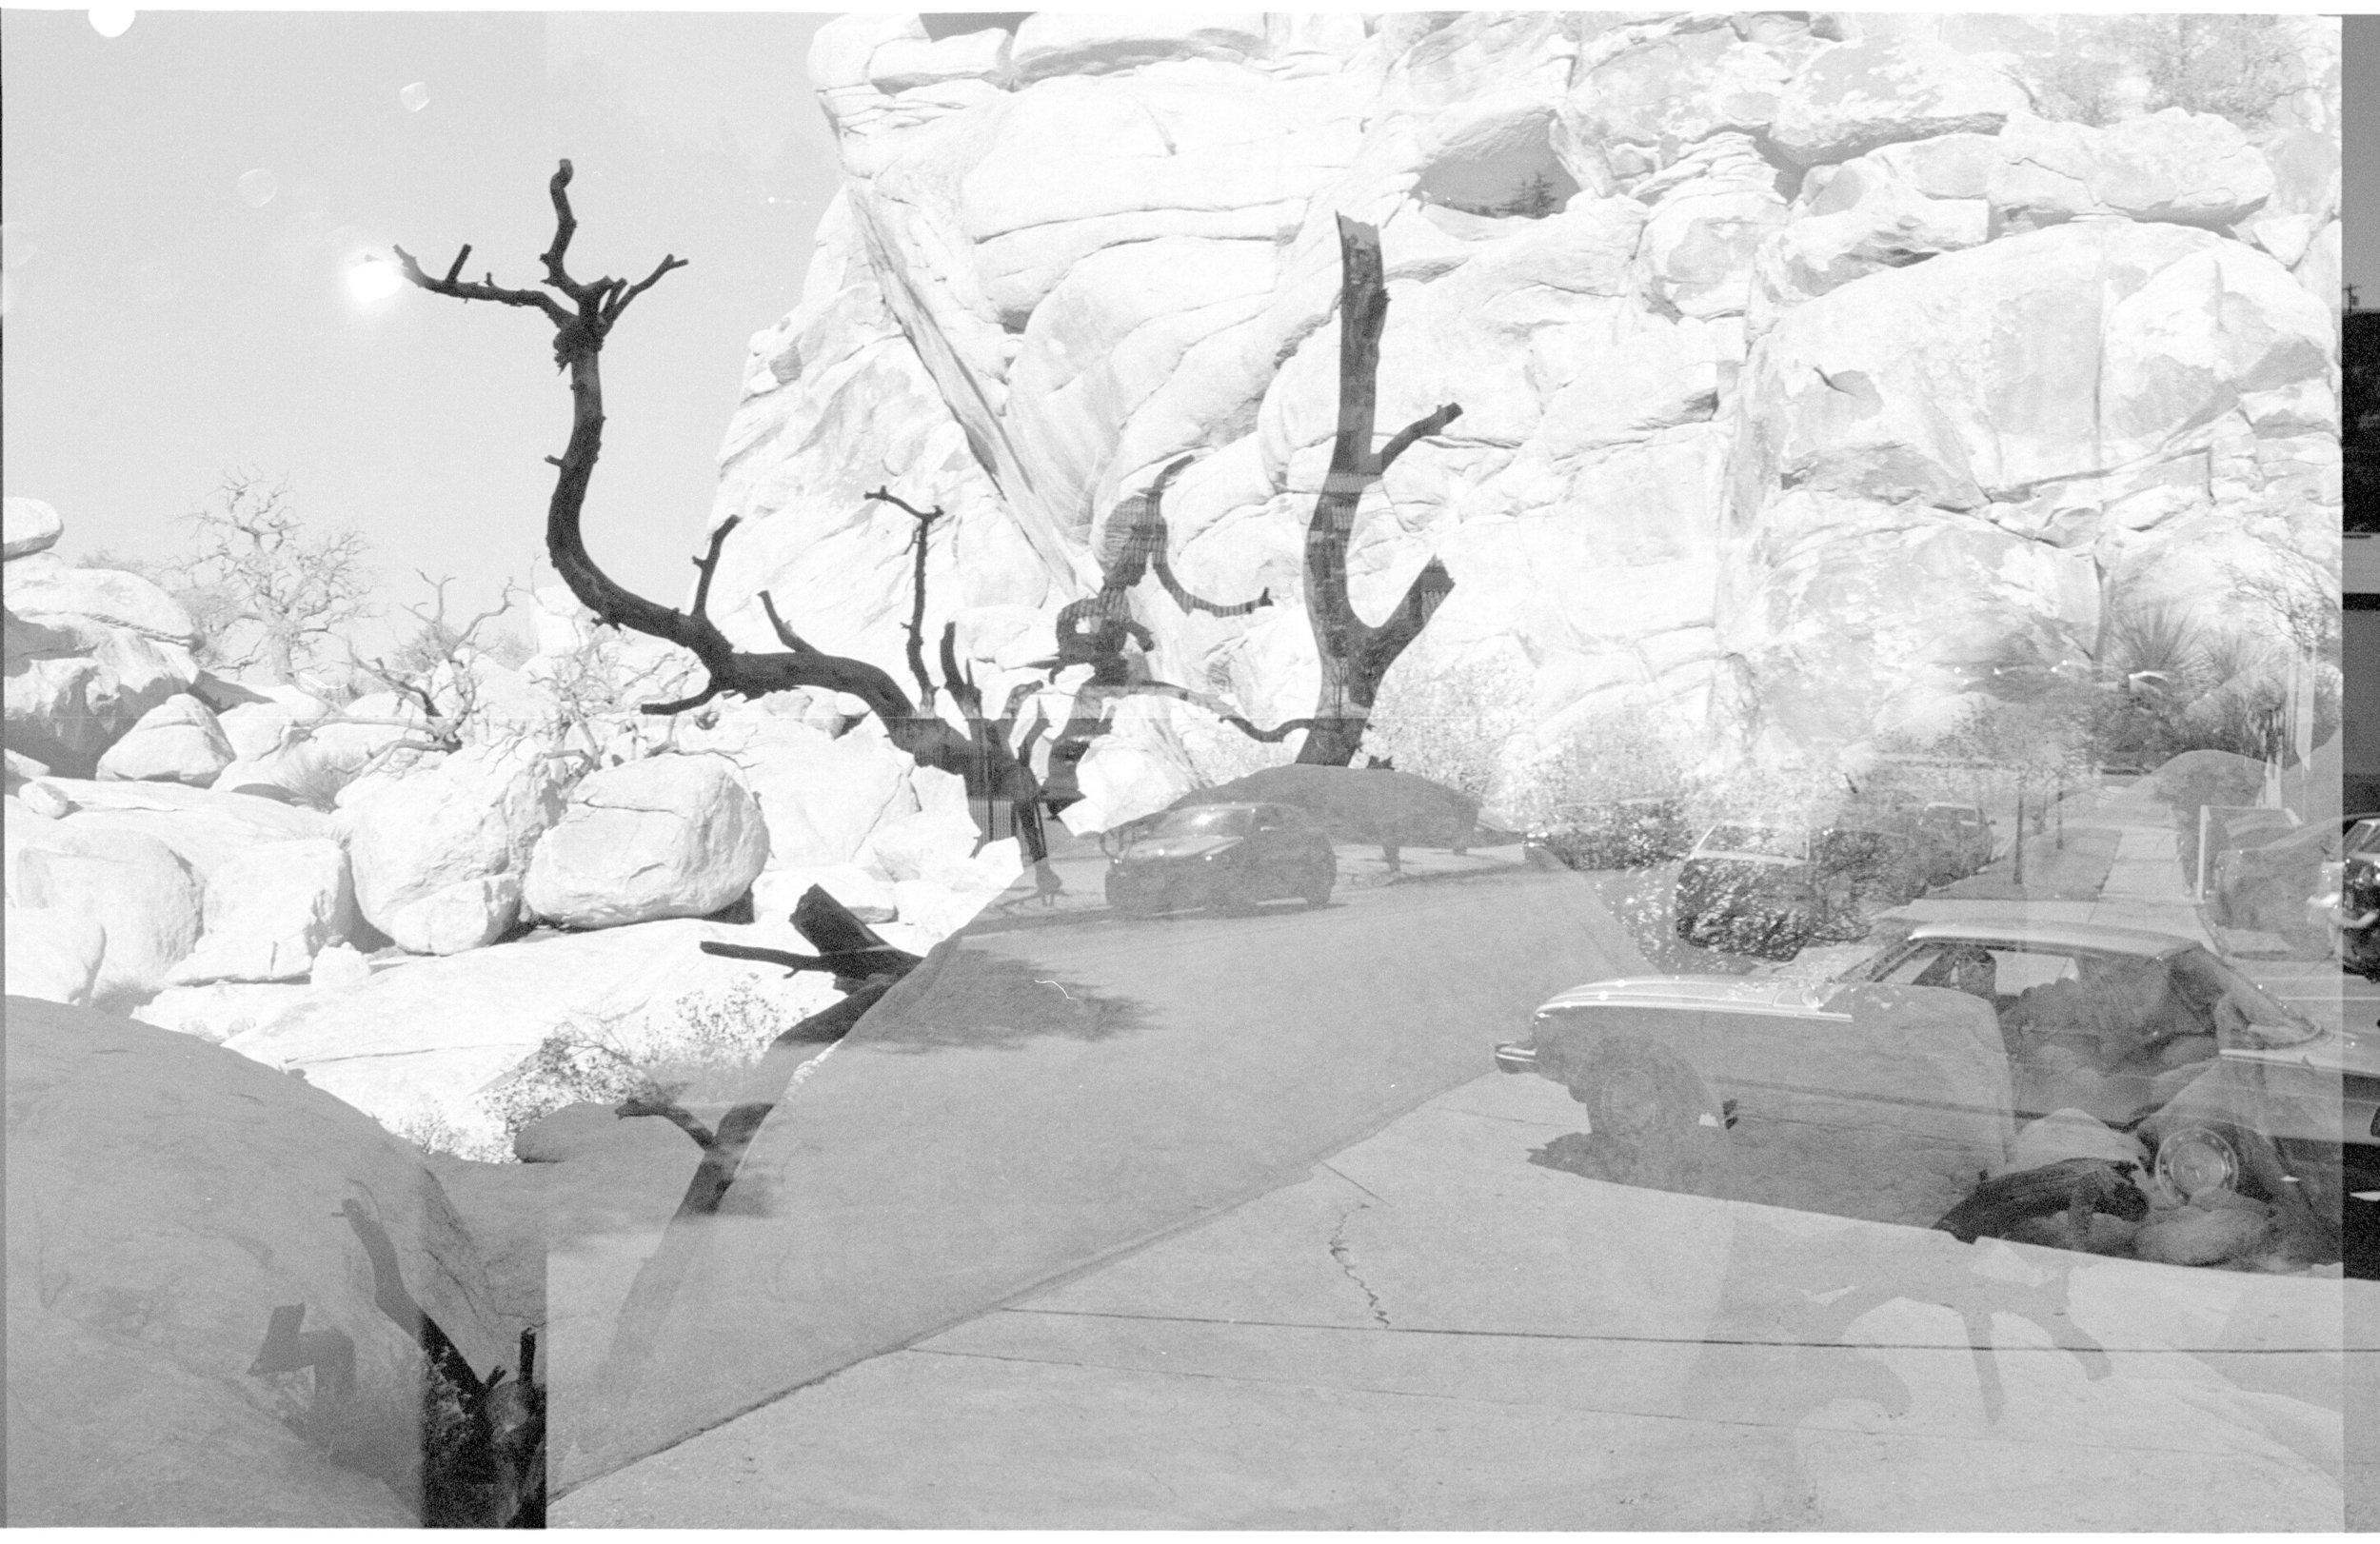 joshua tree, double exposure- trees and cars